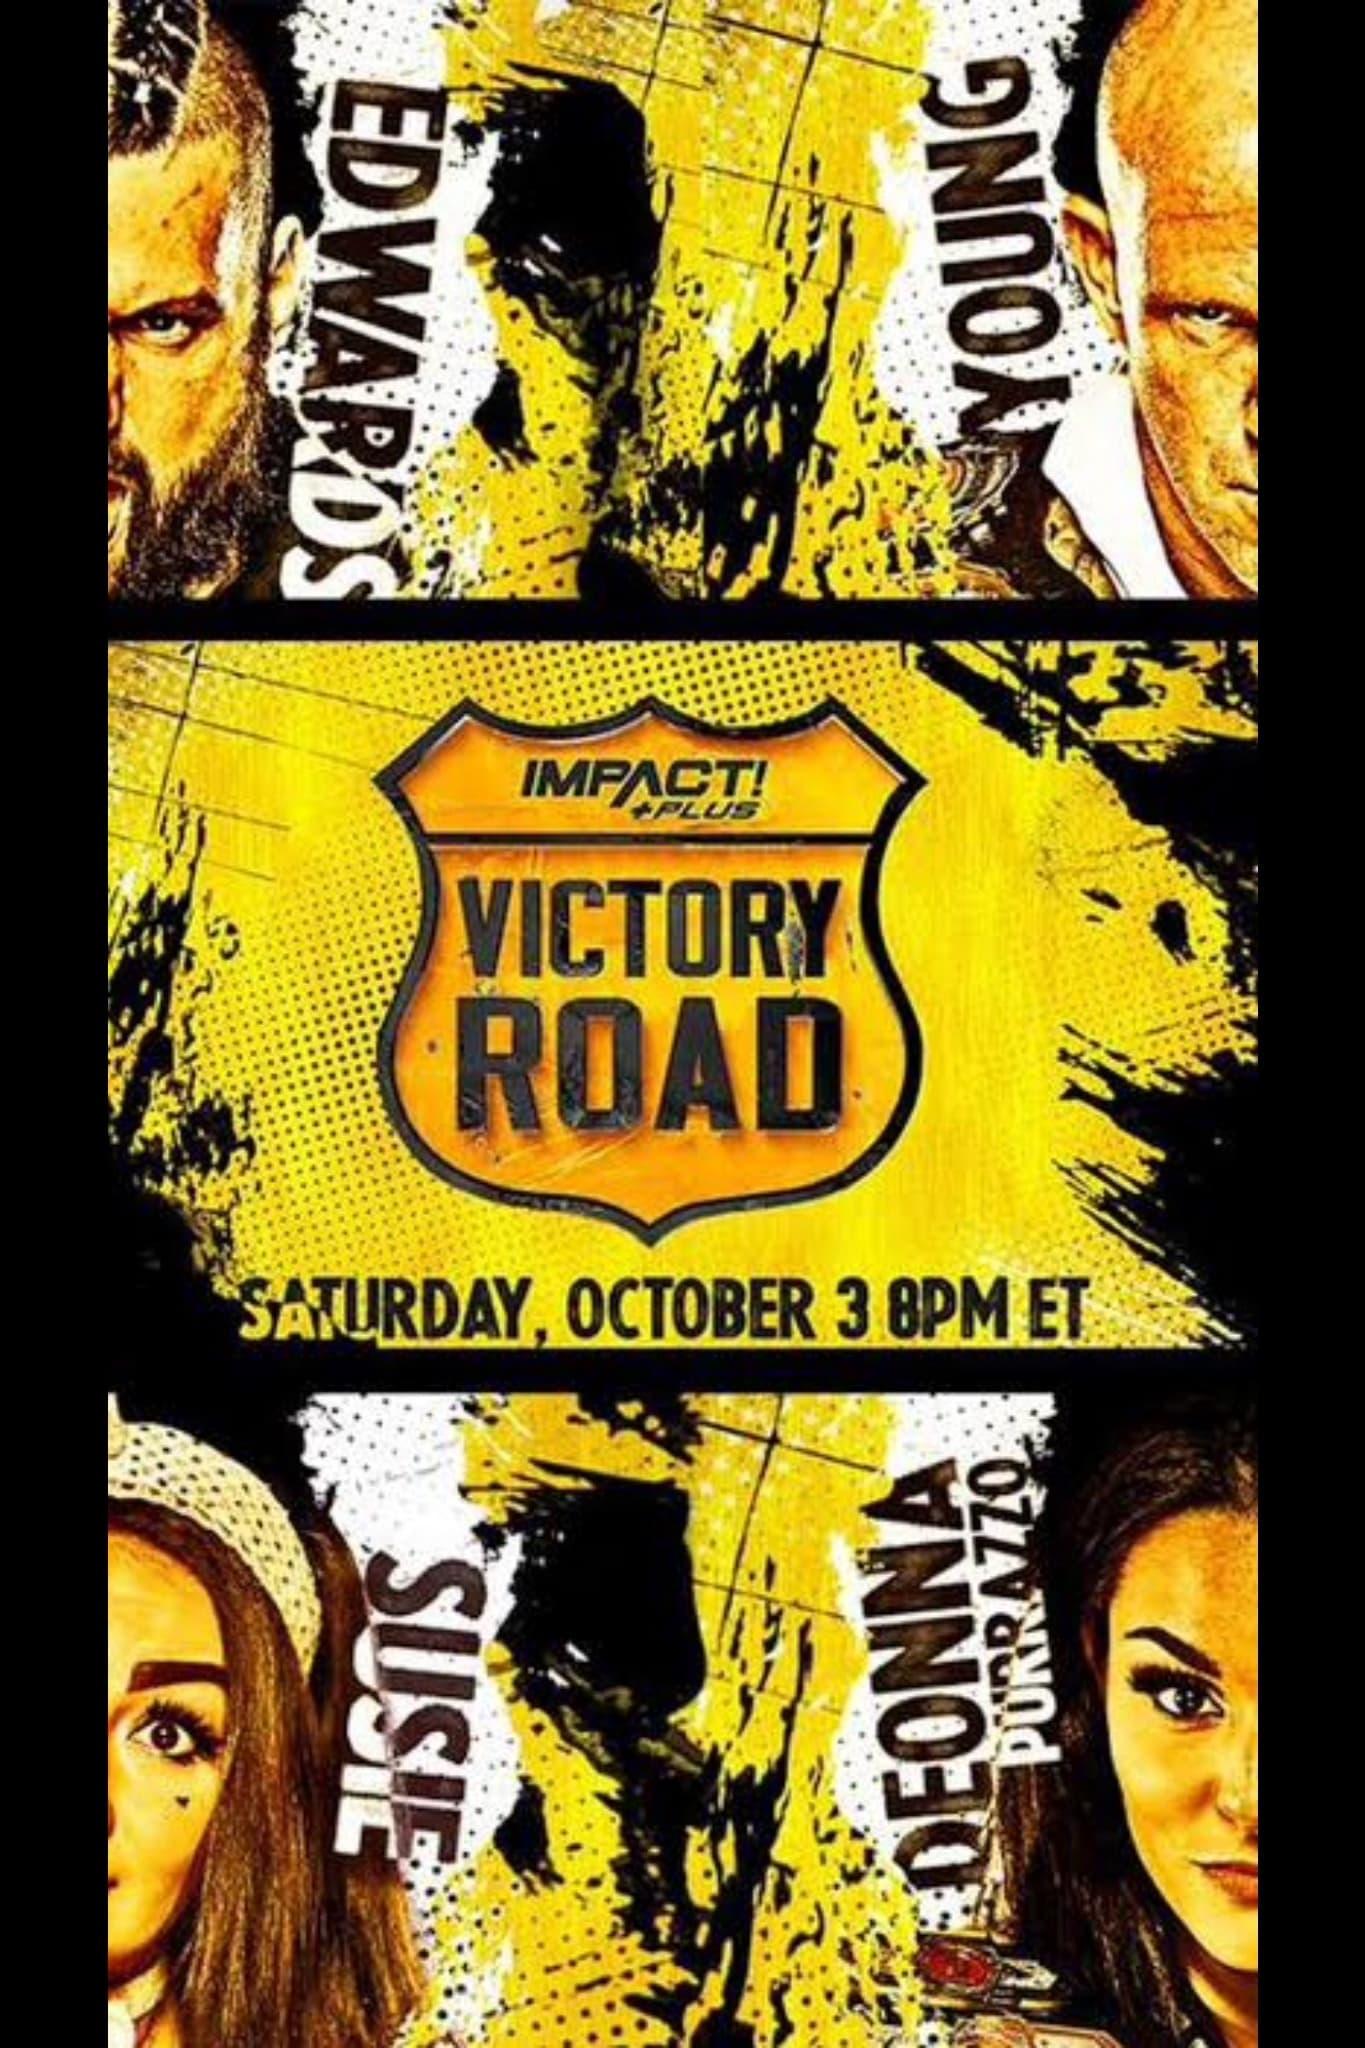 IMPACT! Plus: Victory Road